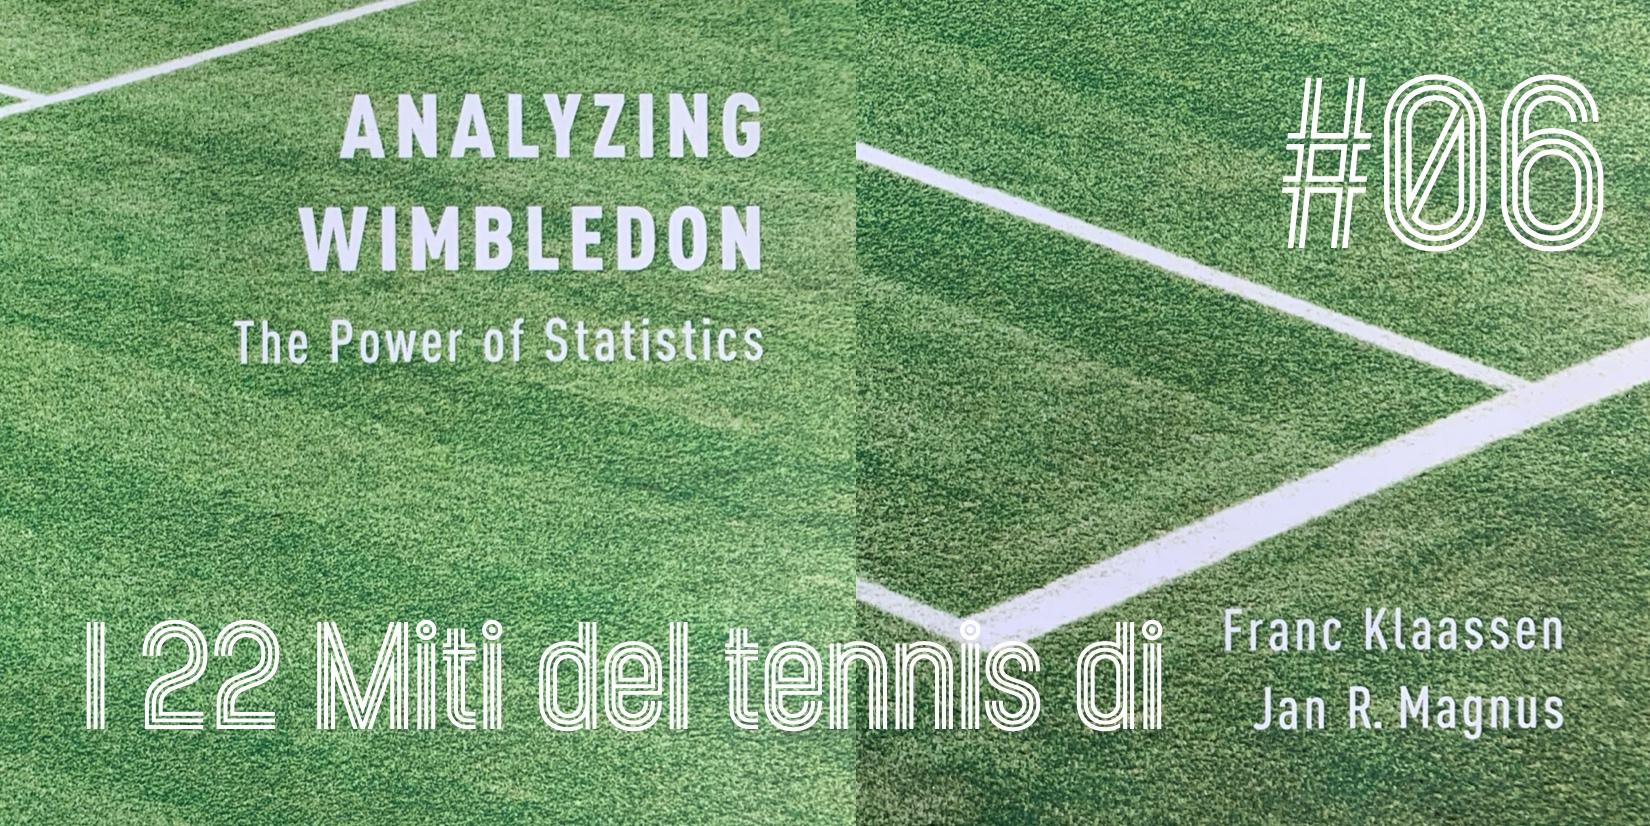 I 22 miti del tennis di Klaassen & Magnus – Mito 6 - settesei.it